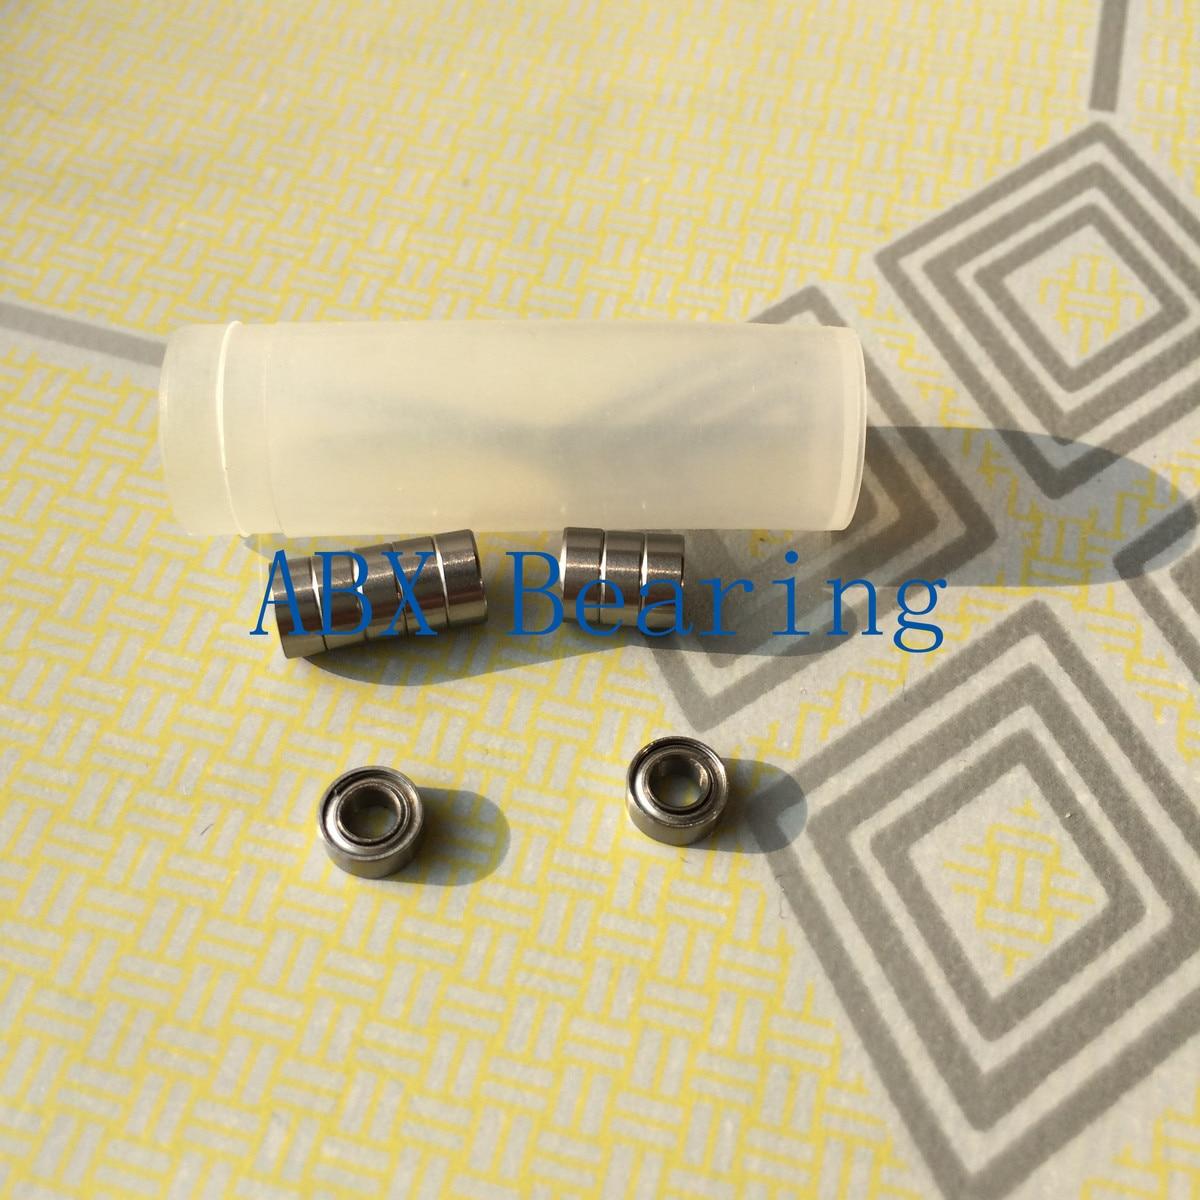 Free shipping 50pcs MR62ZZ R-620ZZ MR62Z MR62 deep groove ball bearing 2x6x2.5 mm miniature bearing 2*6*2.5 mm free shipping 50pcs mr104zz l 1040 mr104 deep groove ball bearing 4x10x4 mm miniature bearing abec3